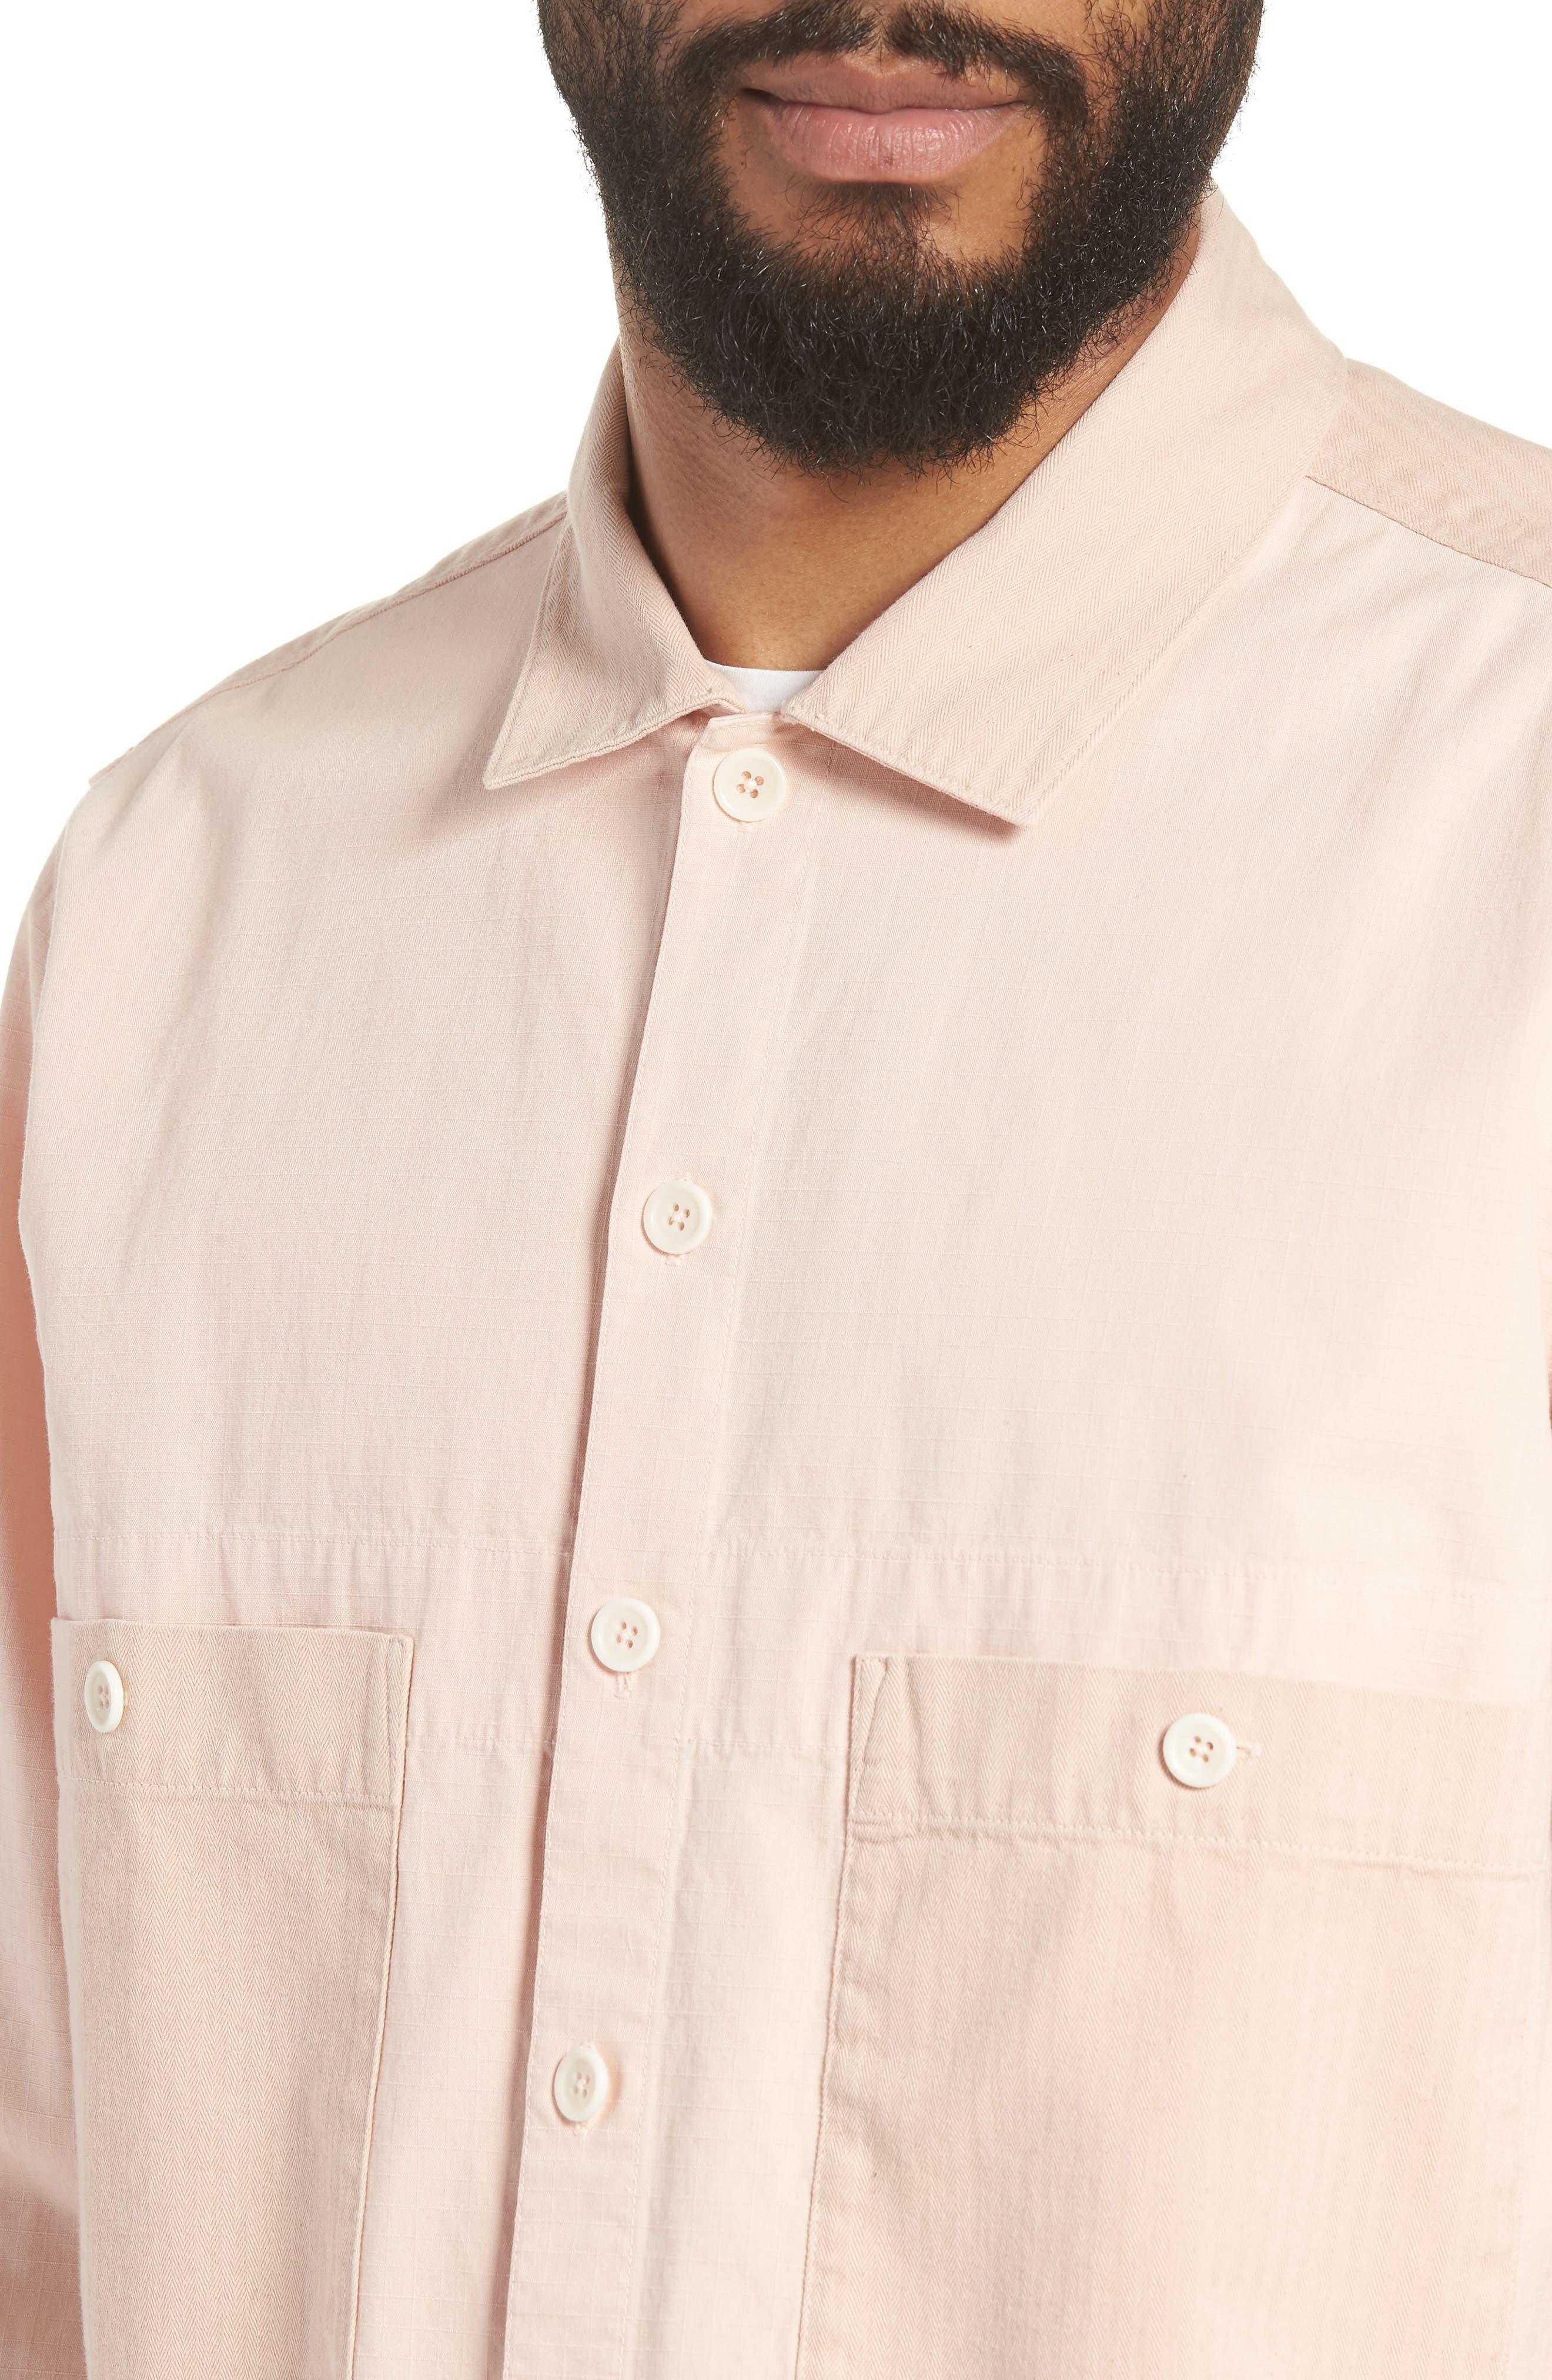 Doc Savage Slim Fit Sport Shirt,                             Alternate thumbnail 4, color,